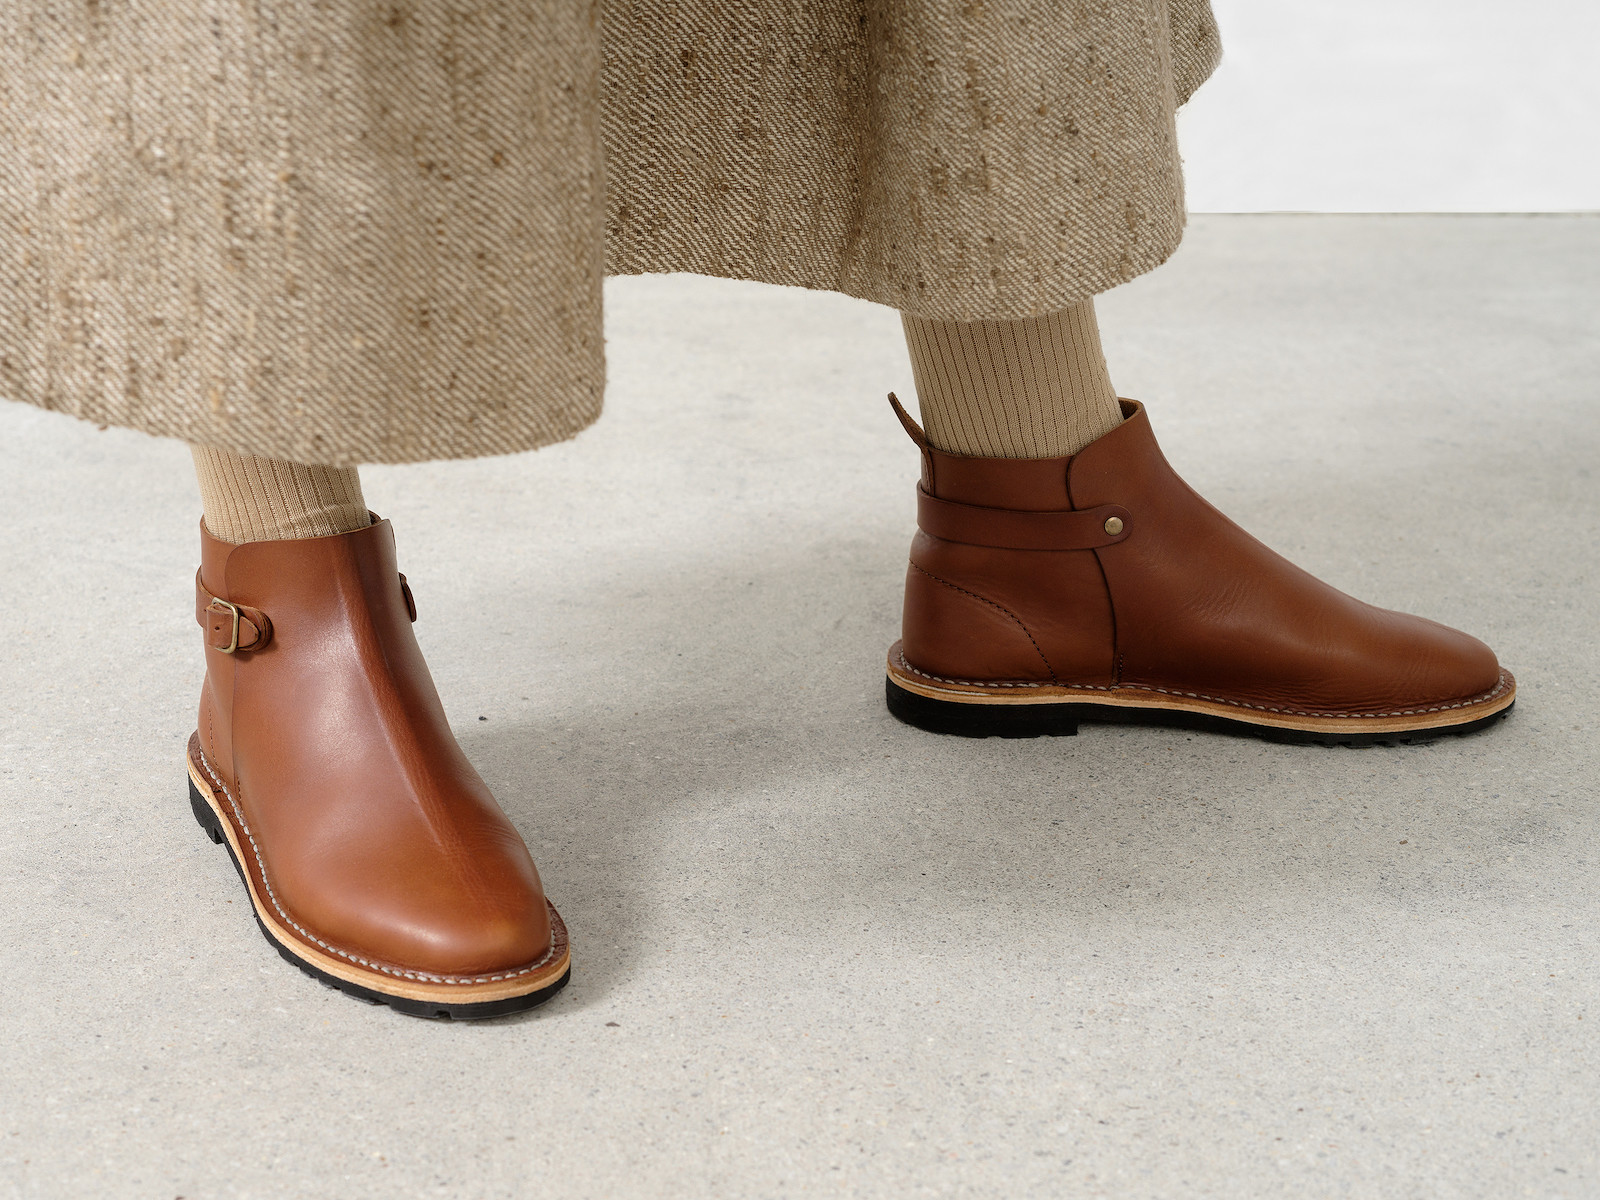 Artisanal boots Image